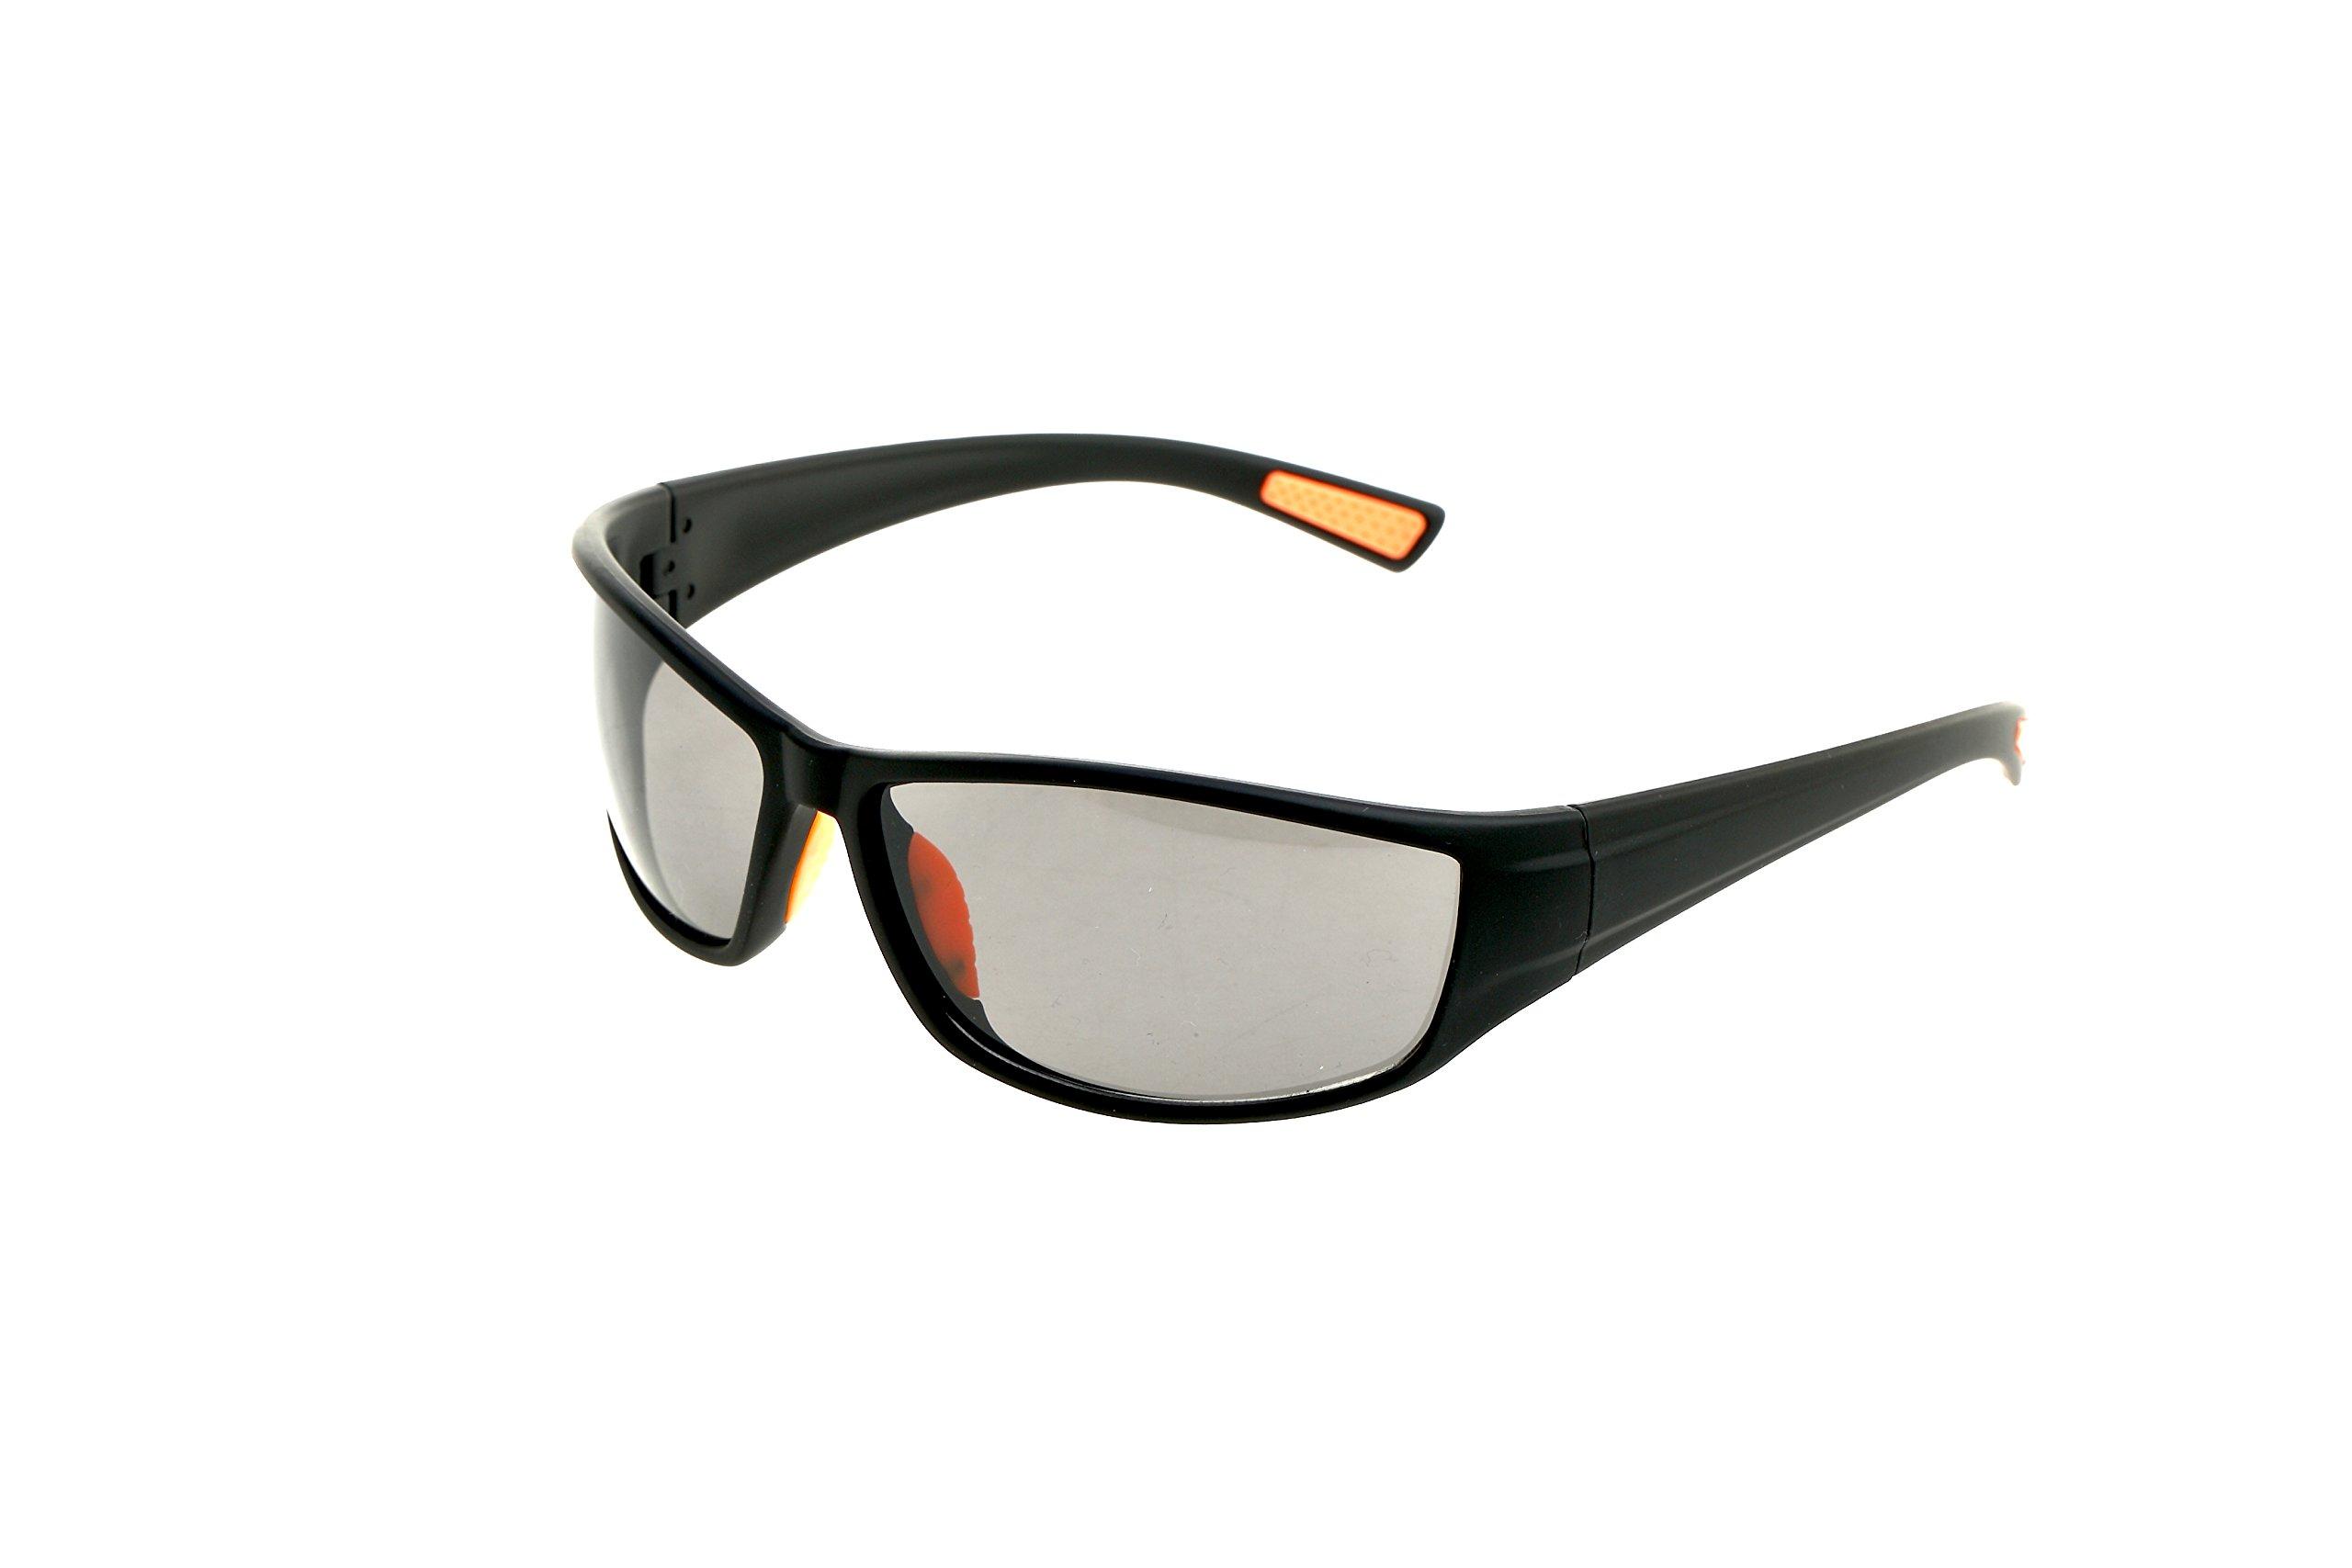 651e0dbb073d Get Quotations · TP-005 Color Blind Glasses Streamline for Sports Use (grey  lenses)